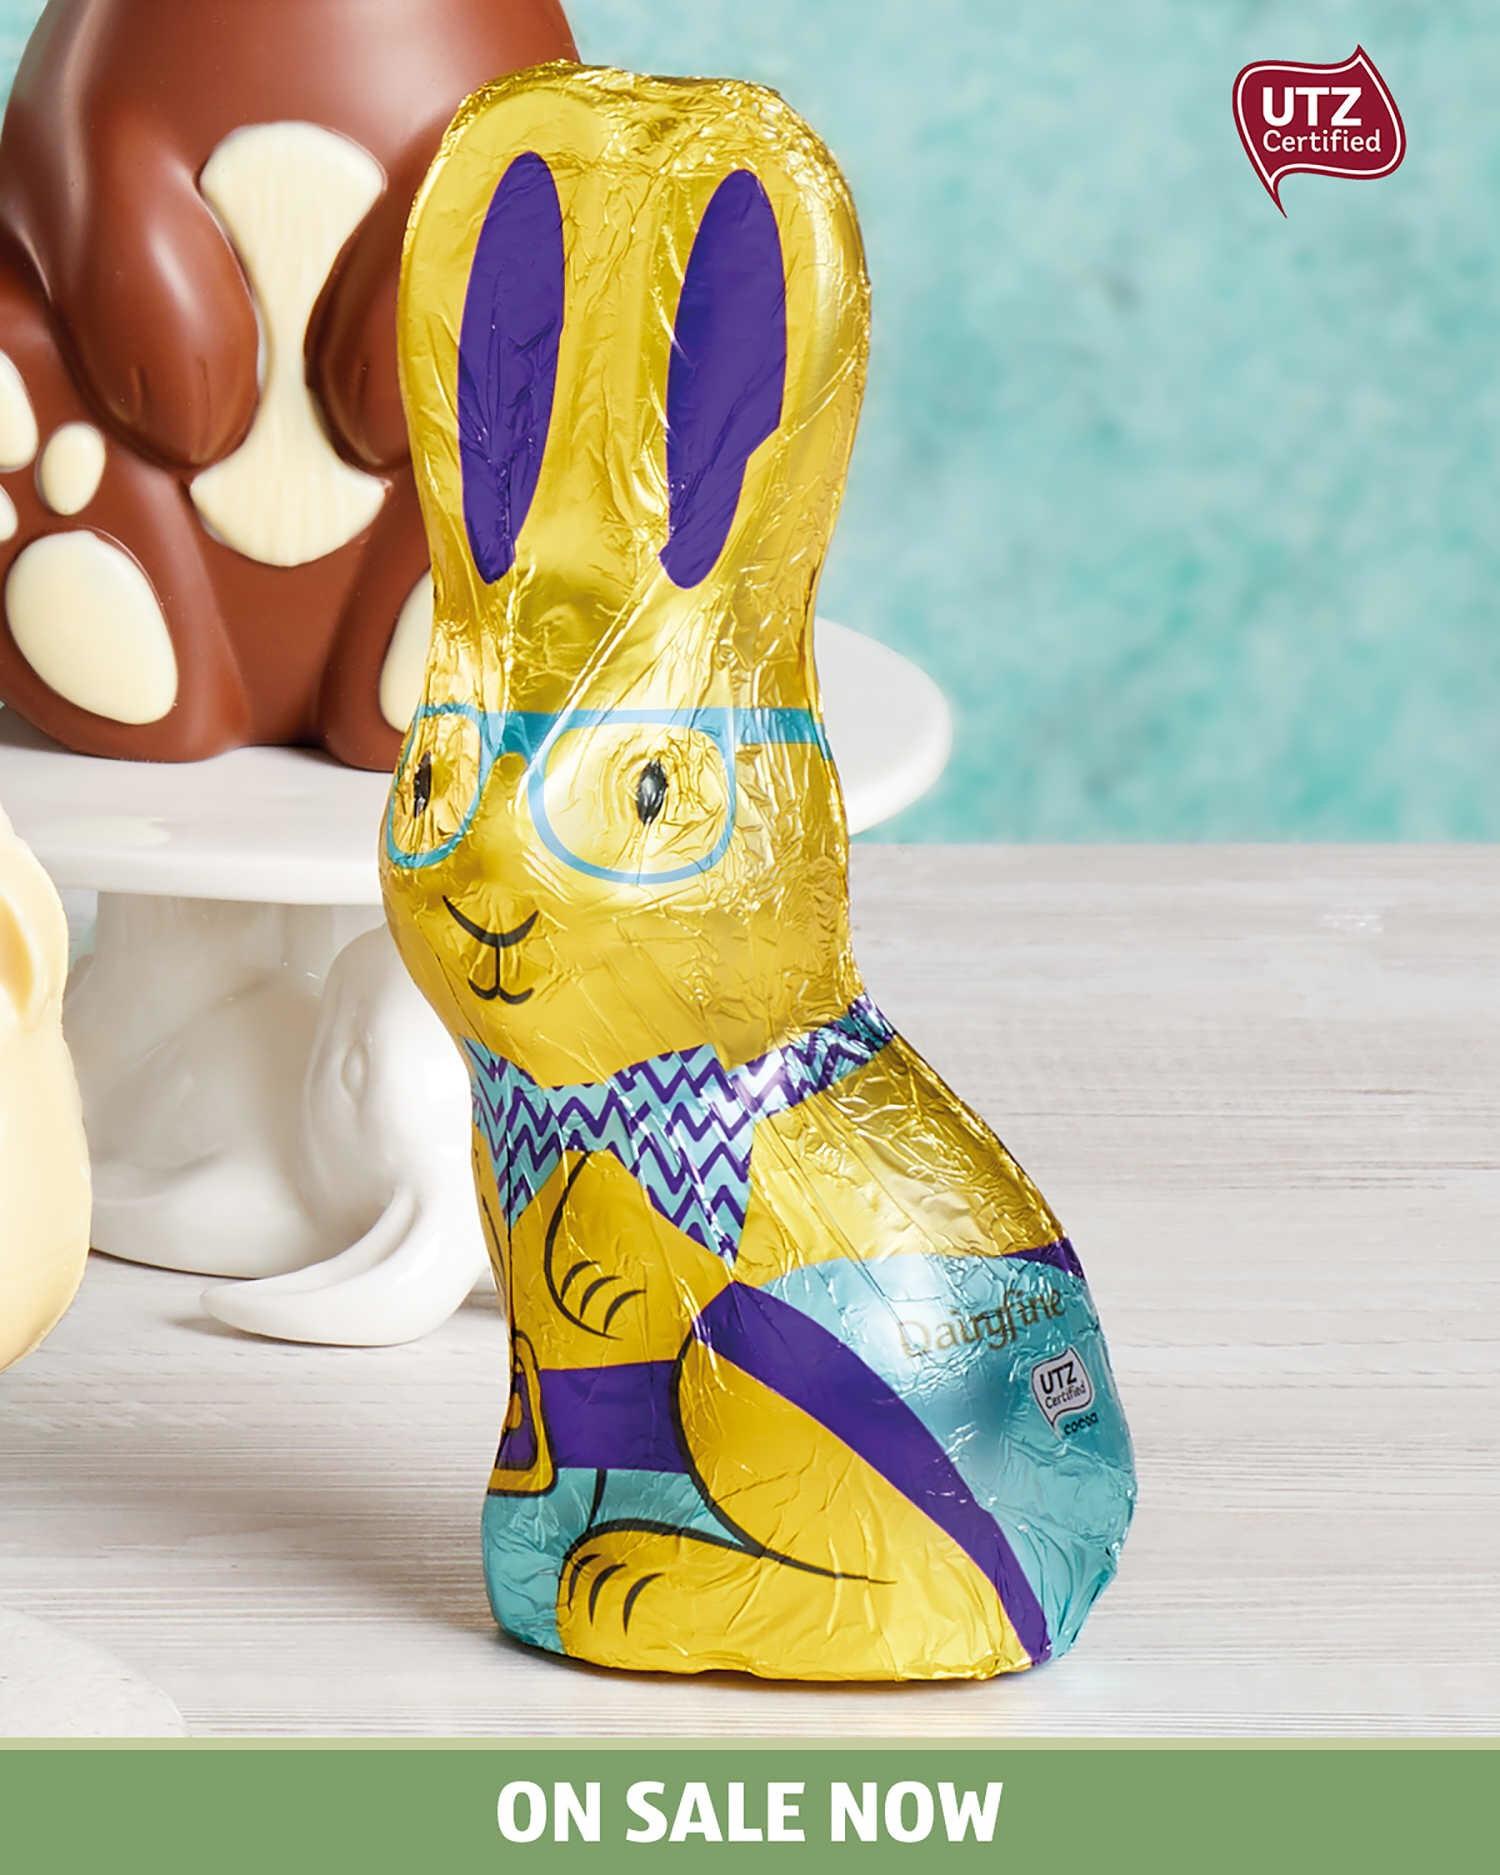 Dairyfine Milk Chocolate Bunny 150g - £0.69 @ Aldi